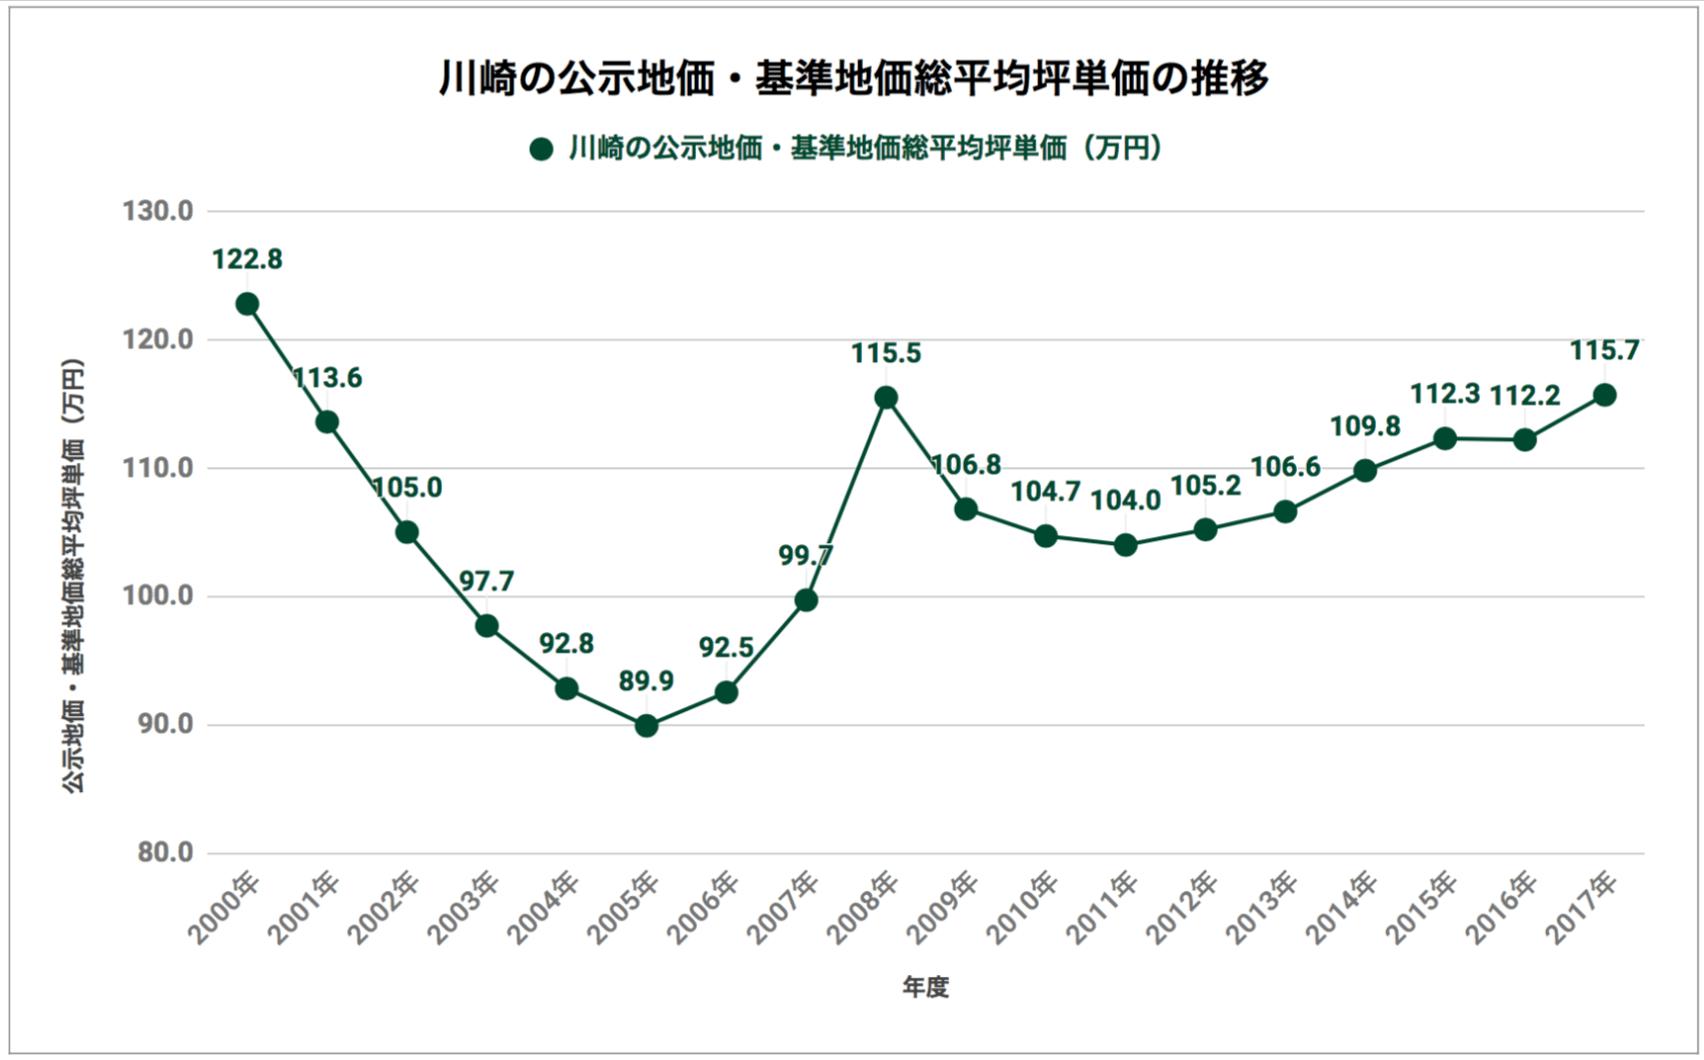 川崎の公示地価・基準地価総平均坪単価の推移